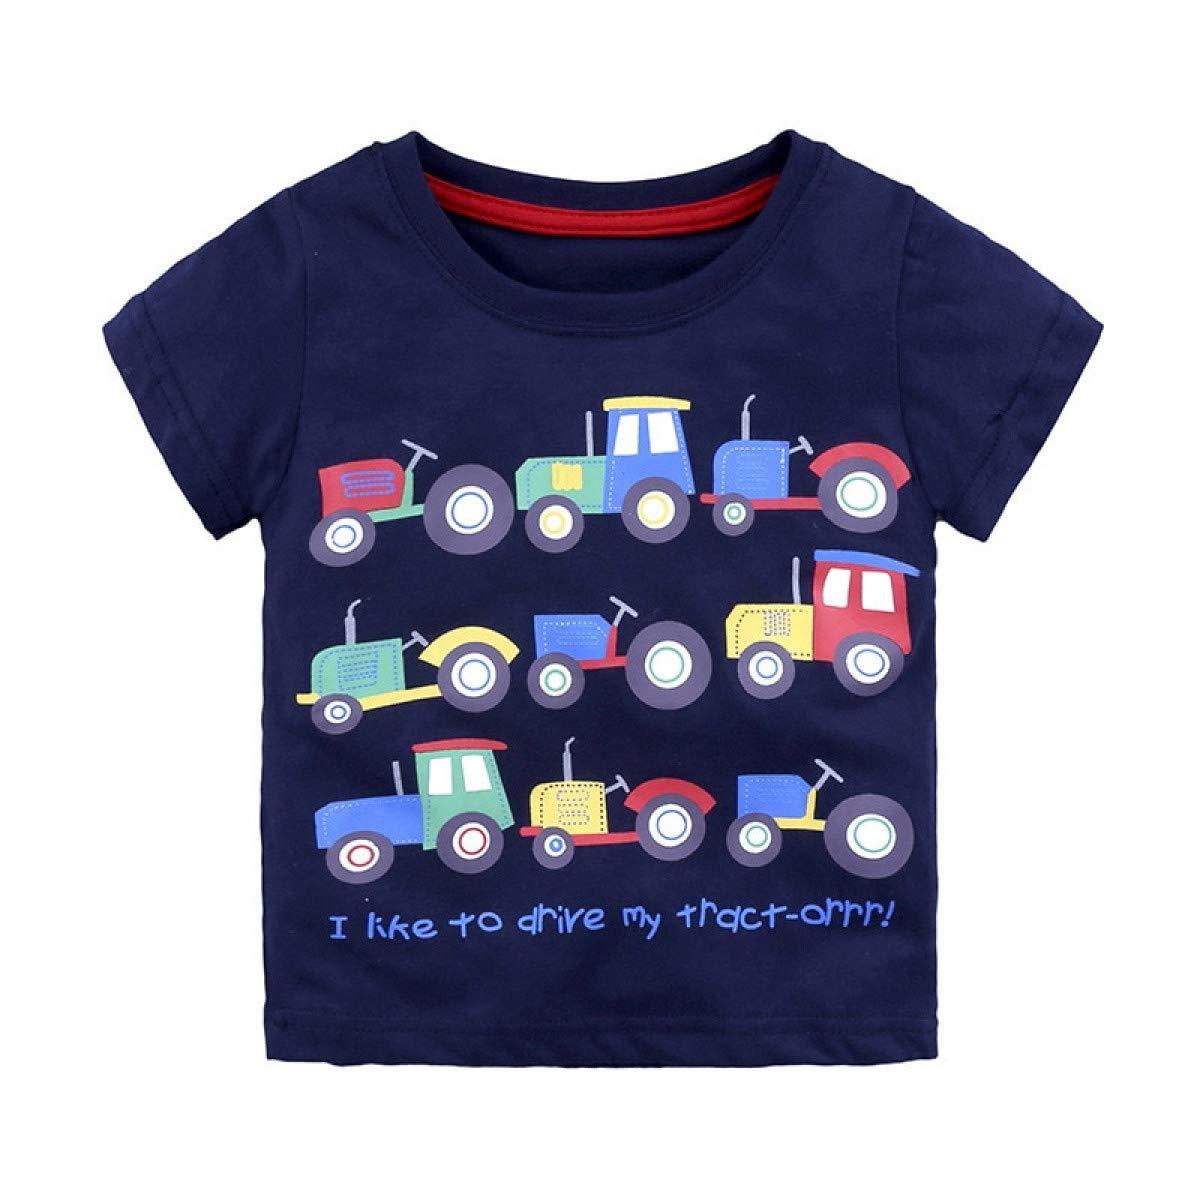 Warlmarts 3-6Y Casual Fashion Summer Toddler Baby Boys Cotton Style Short Sleeve O-Neck